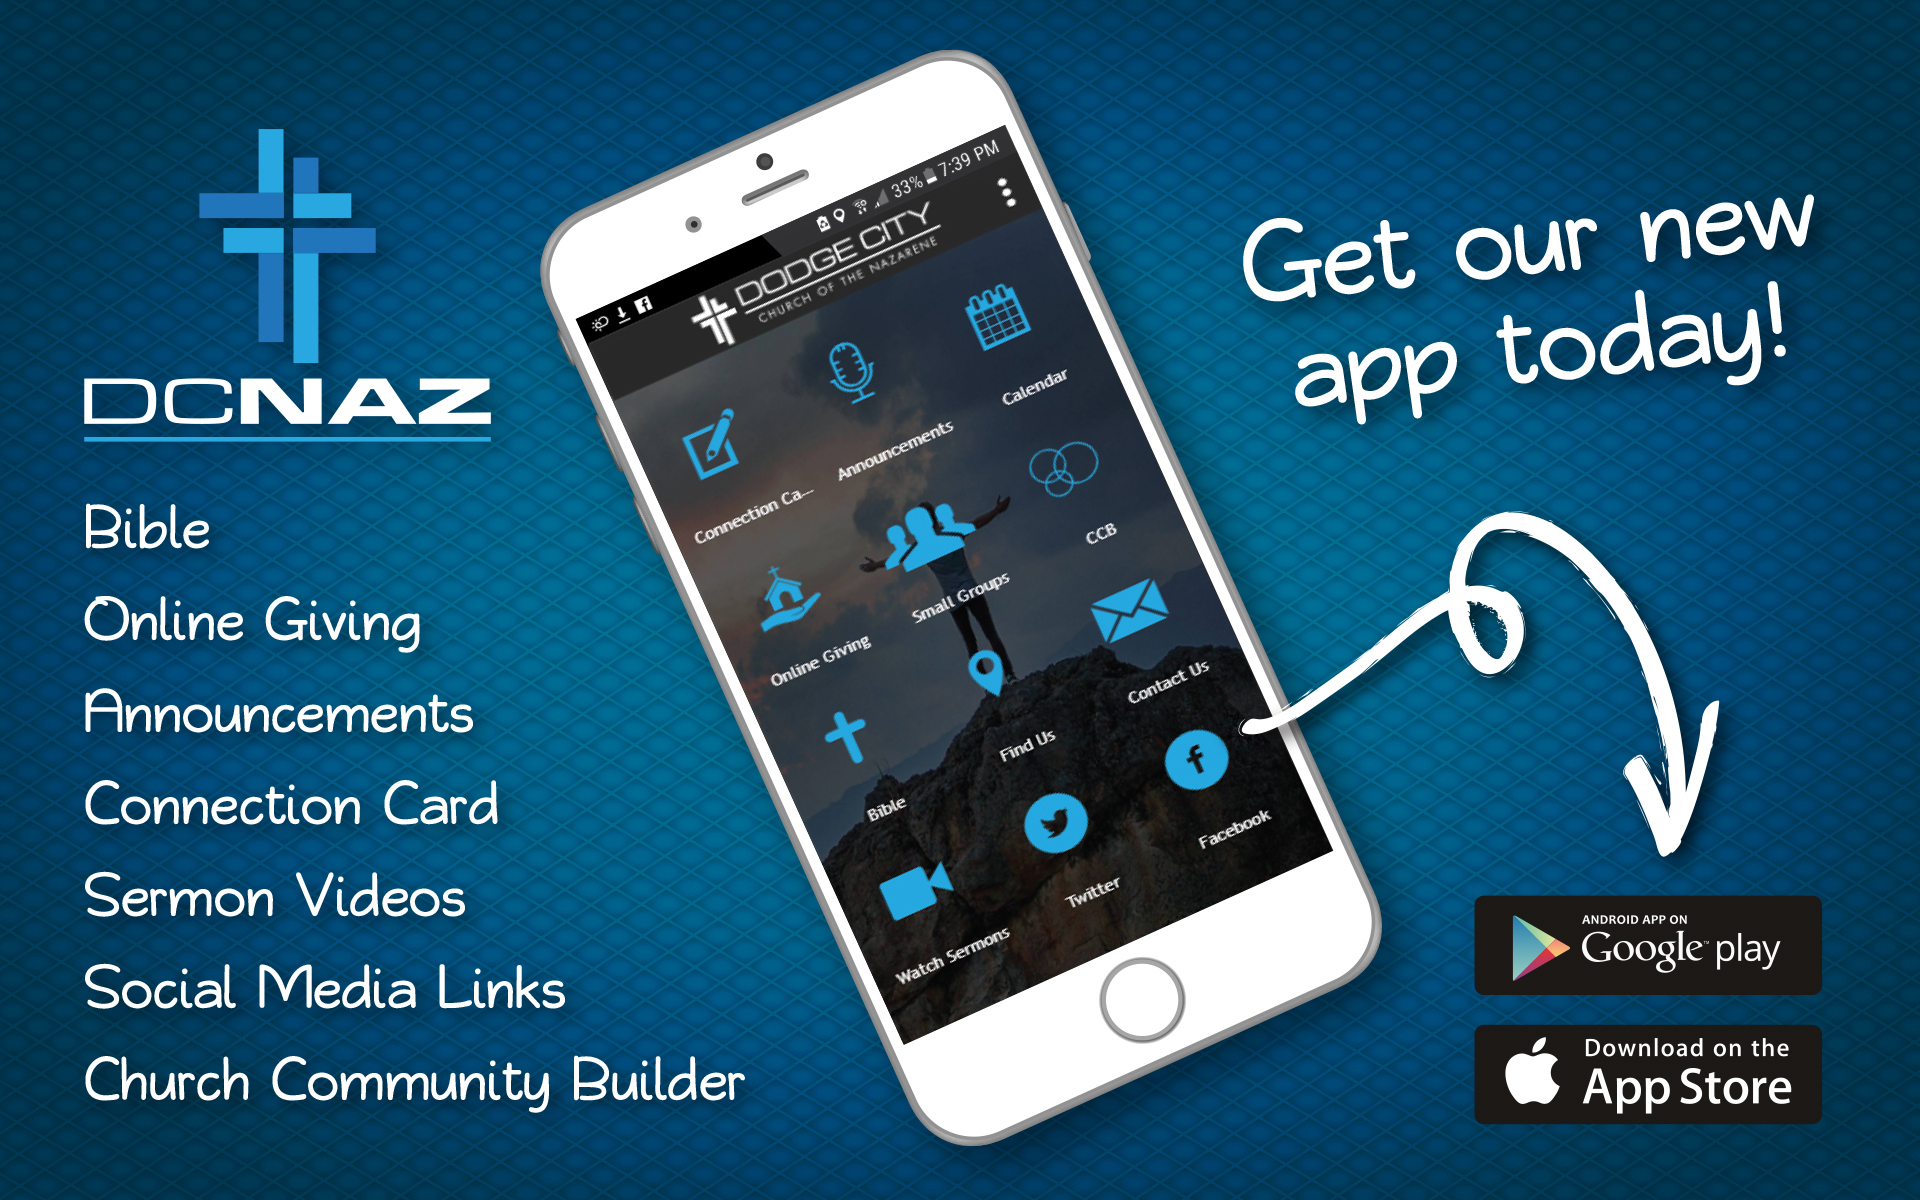 DCNaz App 1920x1200 slide.jpg